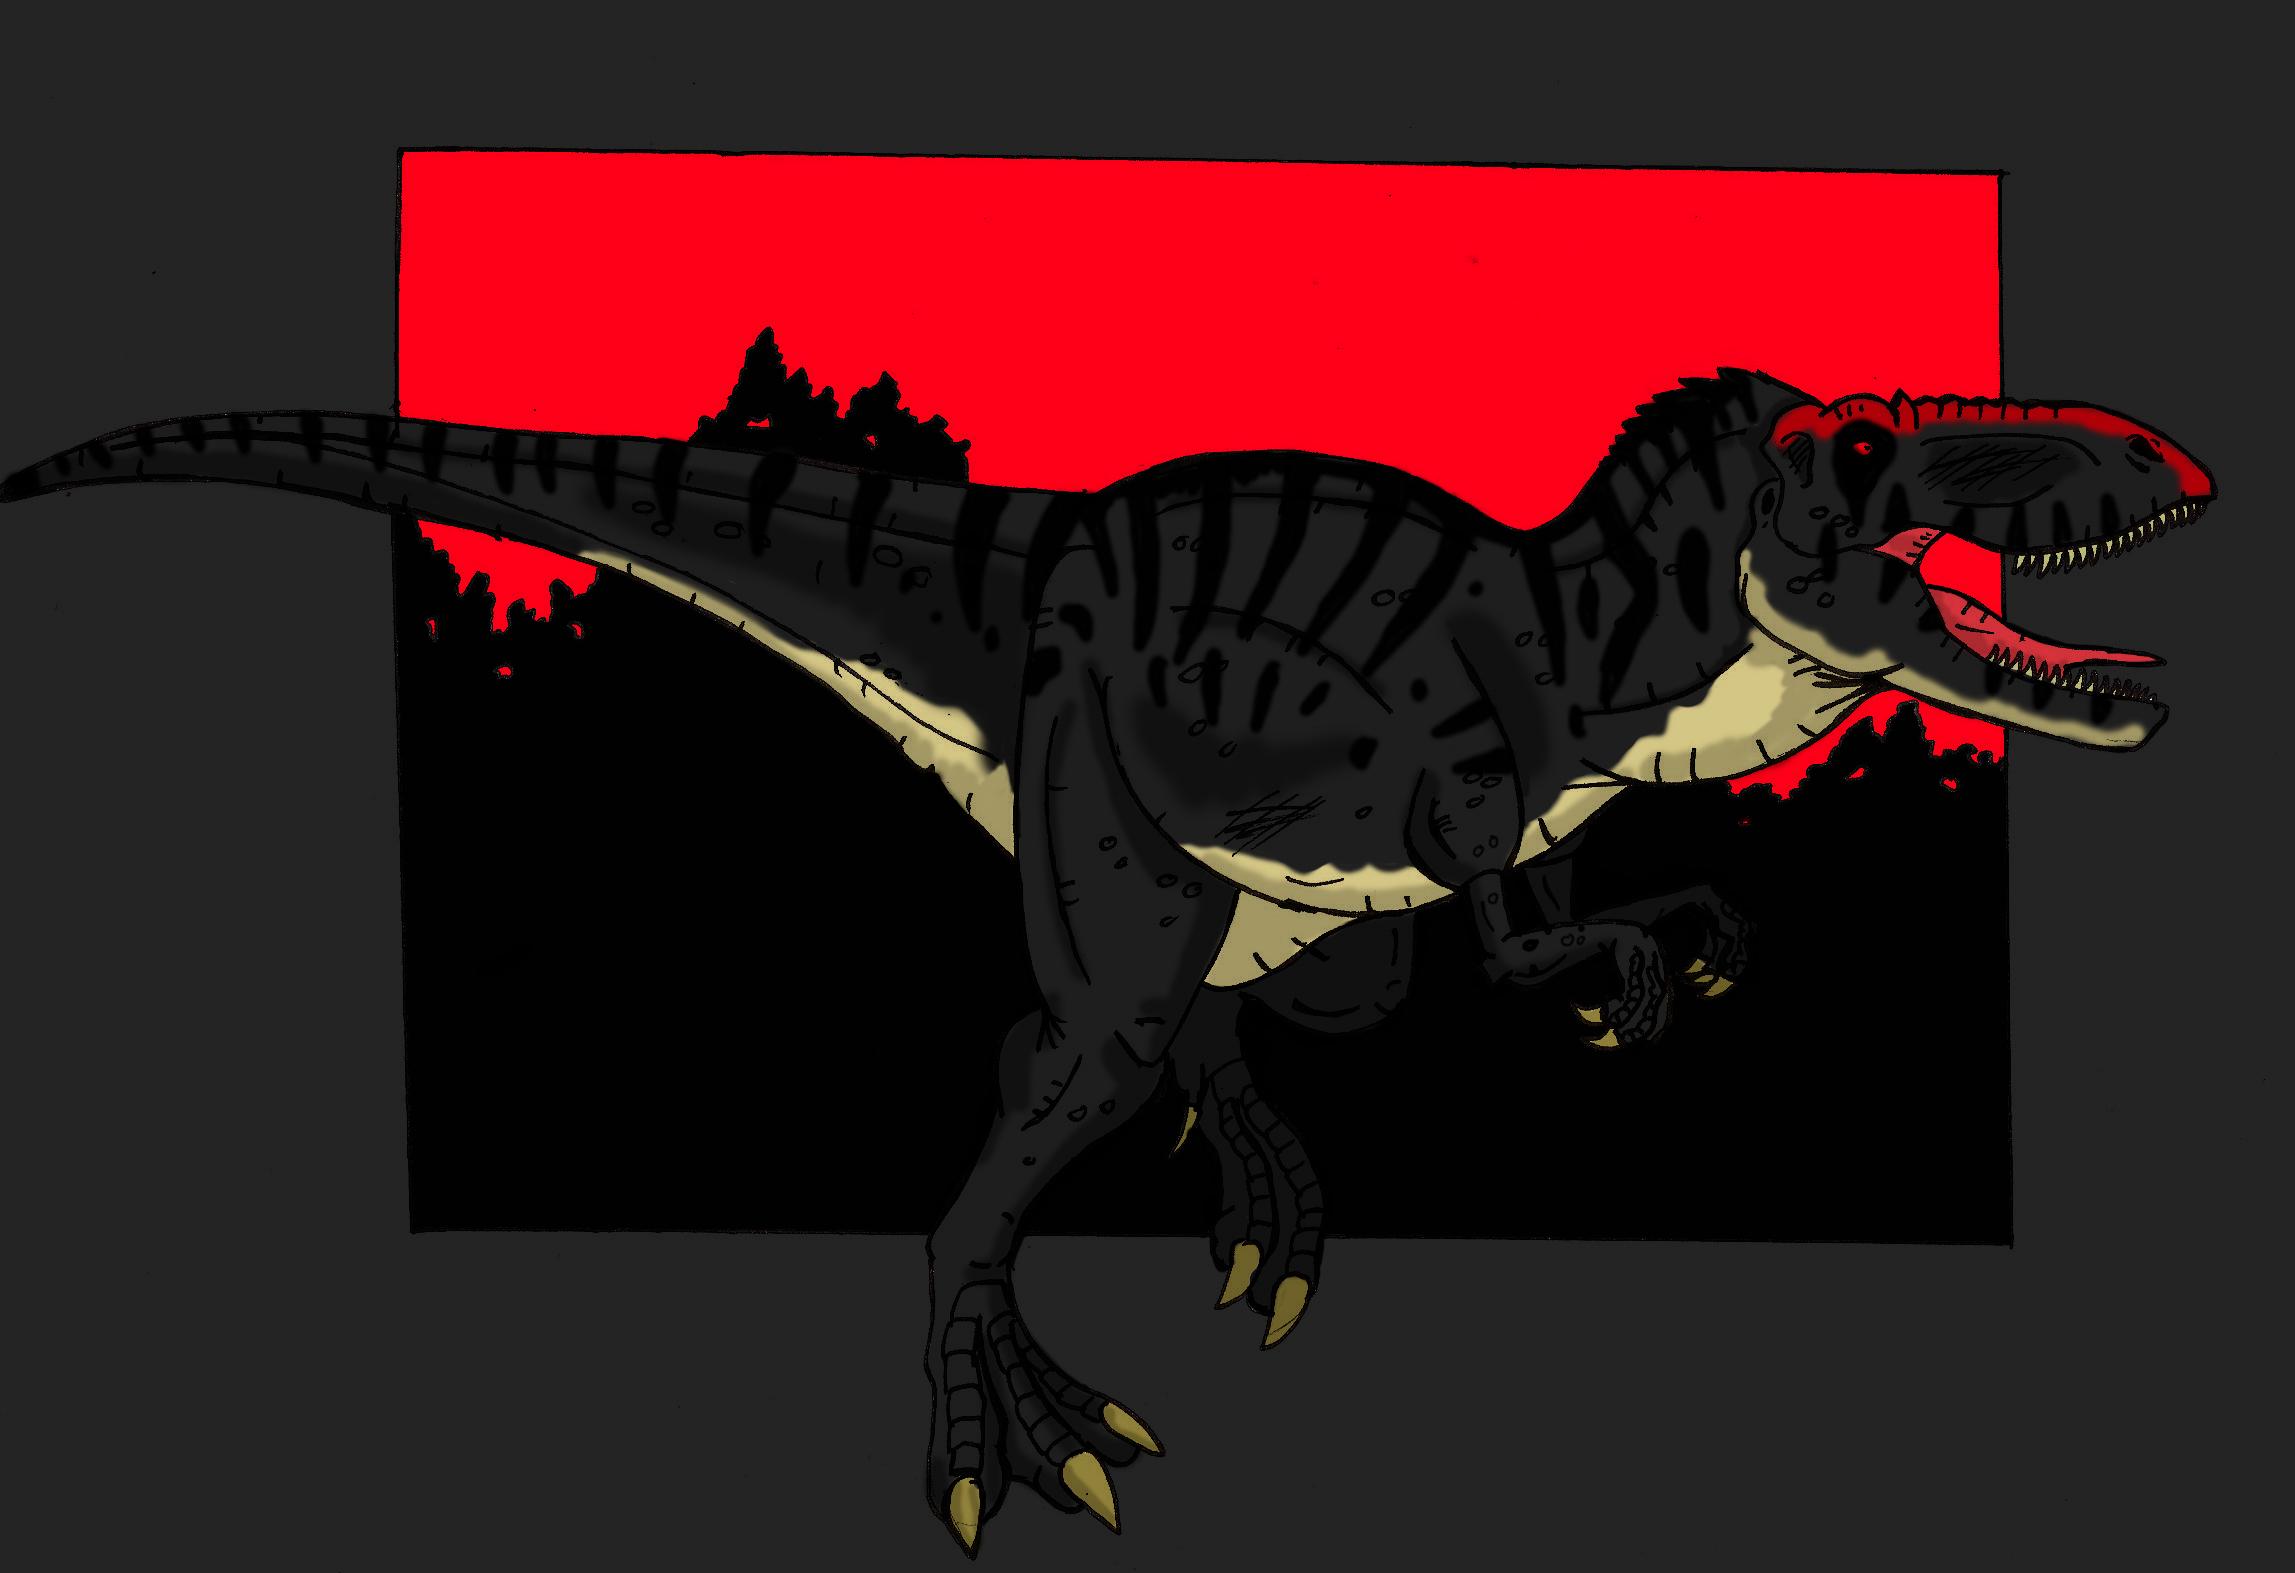 Datei:Carcharodontosaurus.jpg